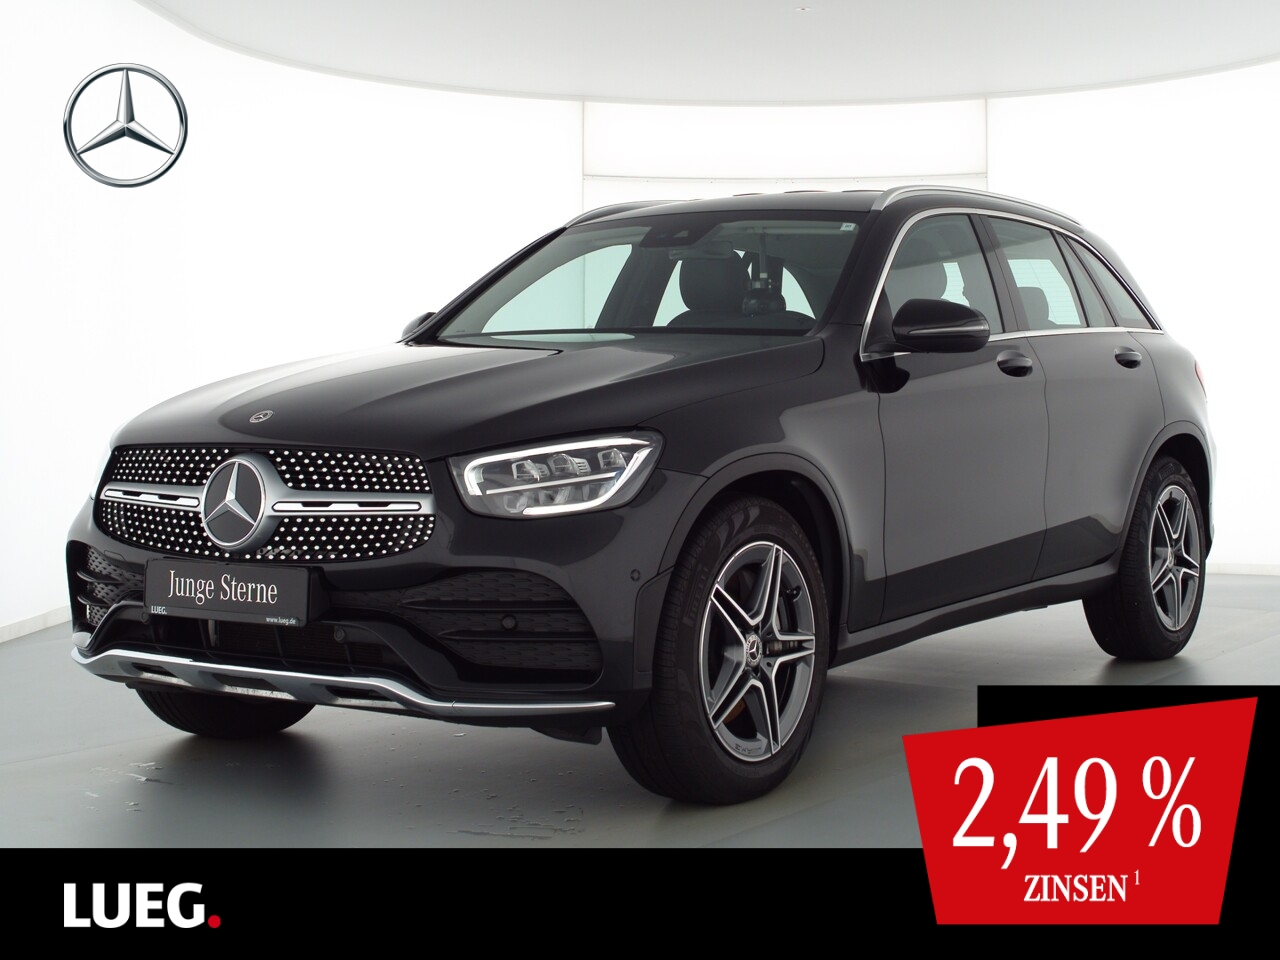 Mercedes-Benz GLC 200 d 4M AMG+MBUX+LED+SpurP+Distr+EHeckk+RFK, Jahr 2021, Diesel